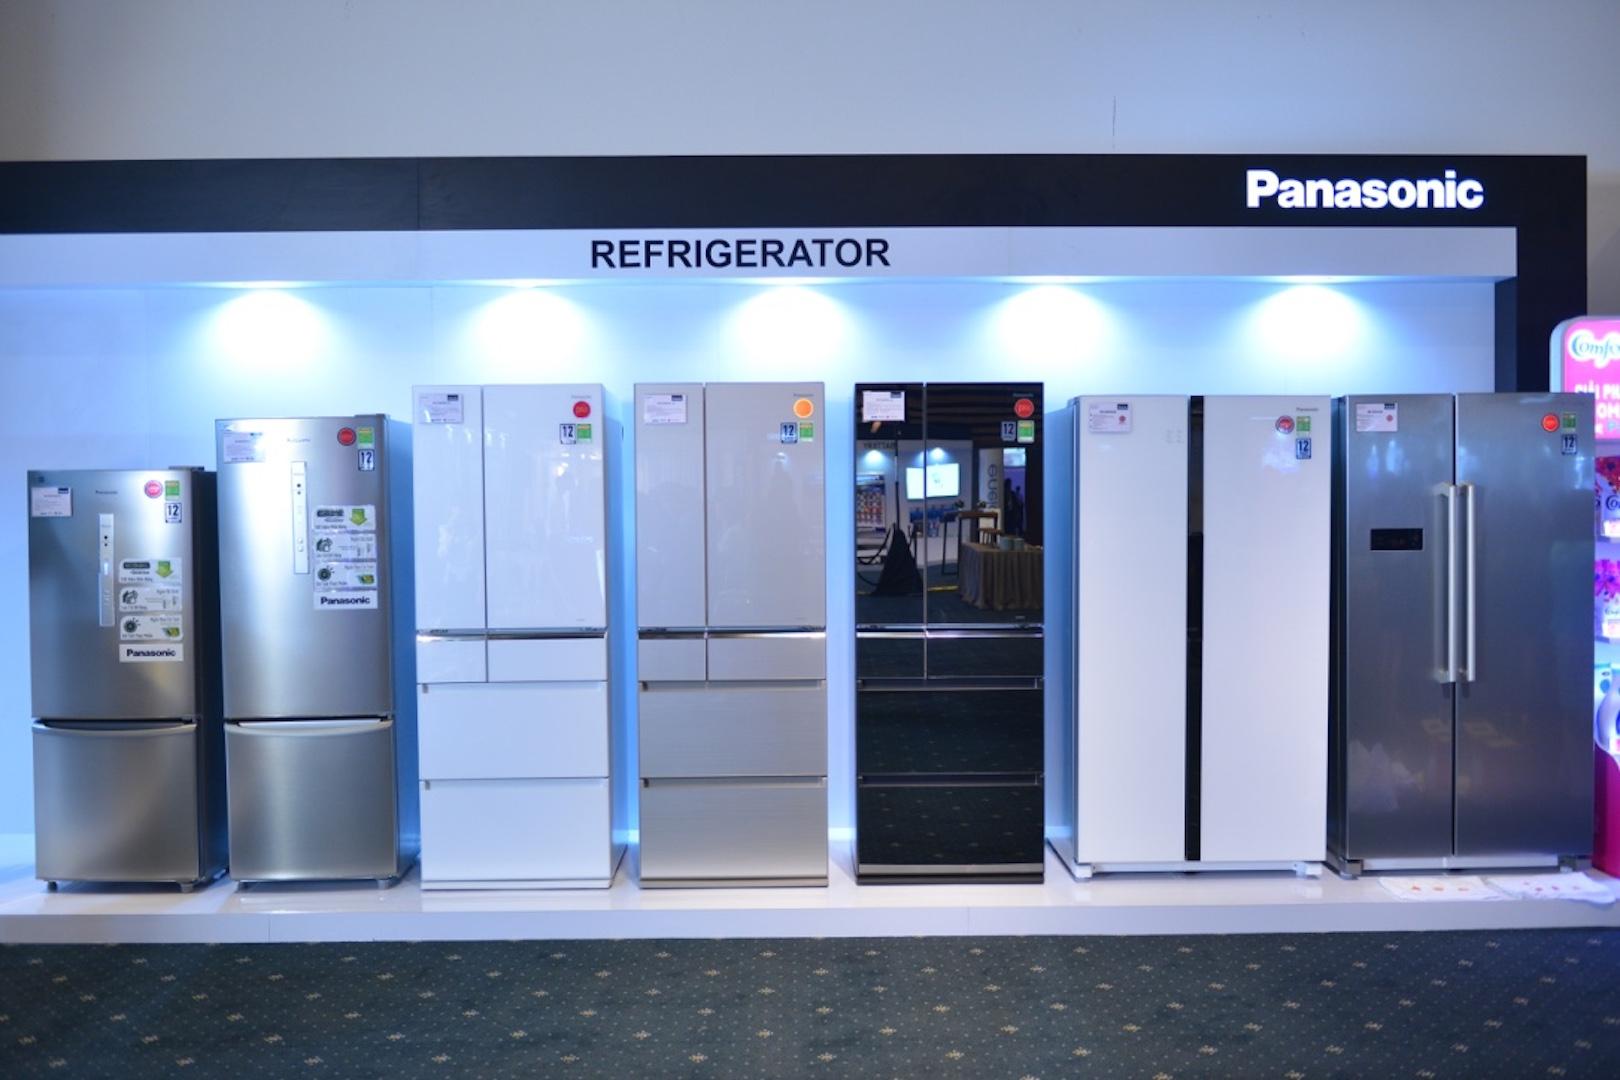 Panasonic Gran Forum 2015 Demonstrates Consumer Products